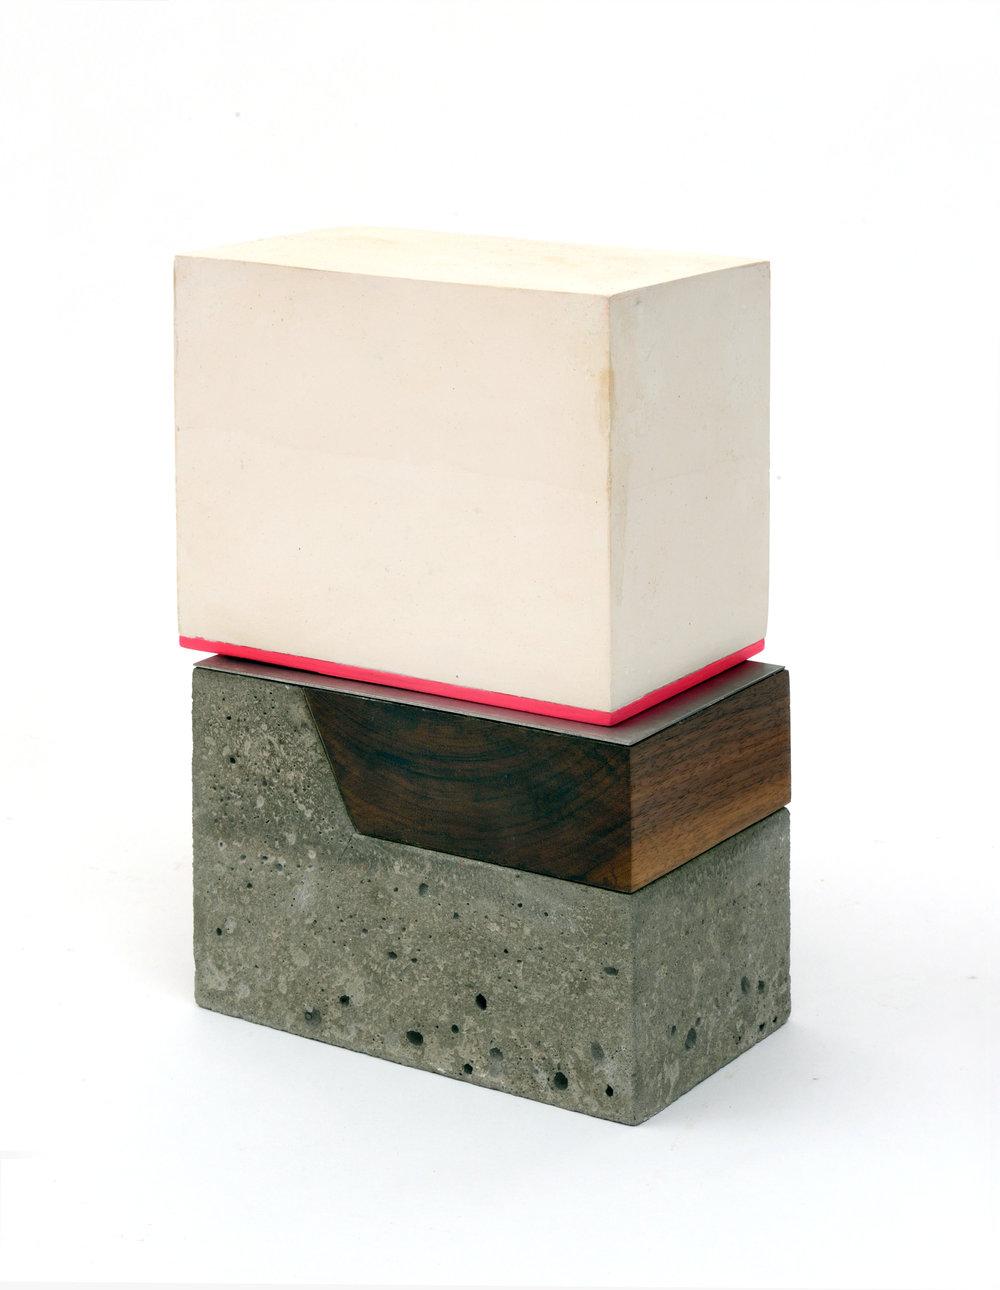 Plaster, Concrete, Steel & Walnut with Pink Line